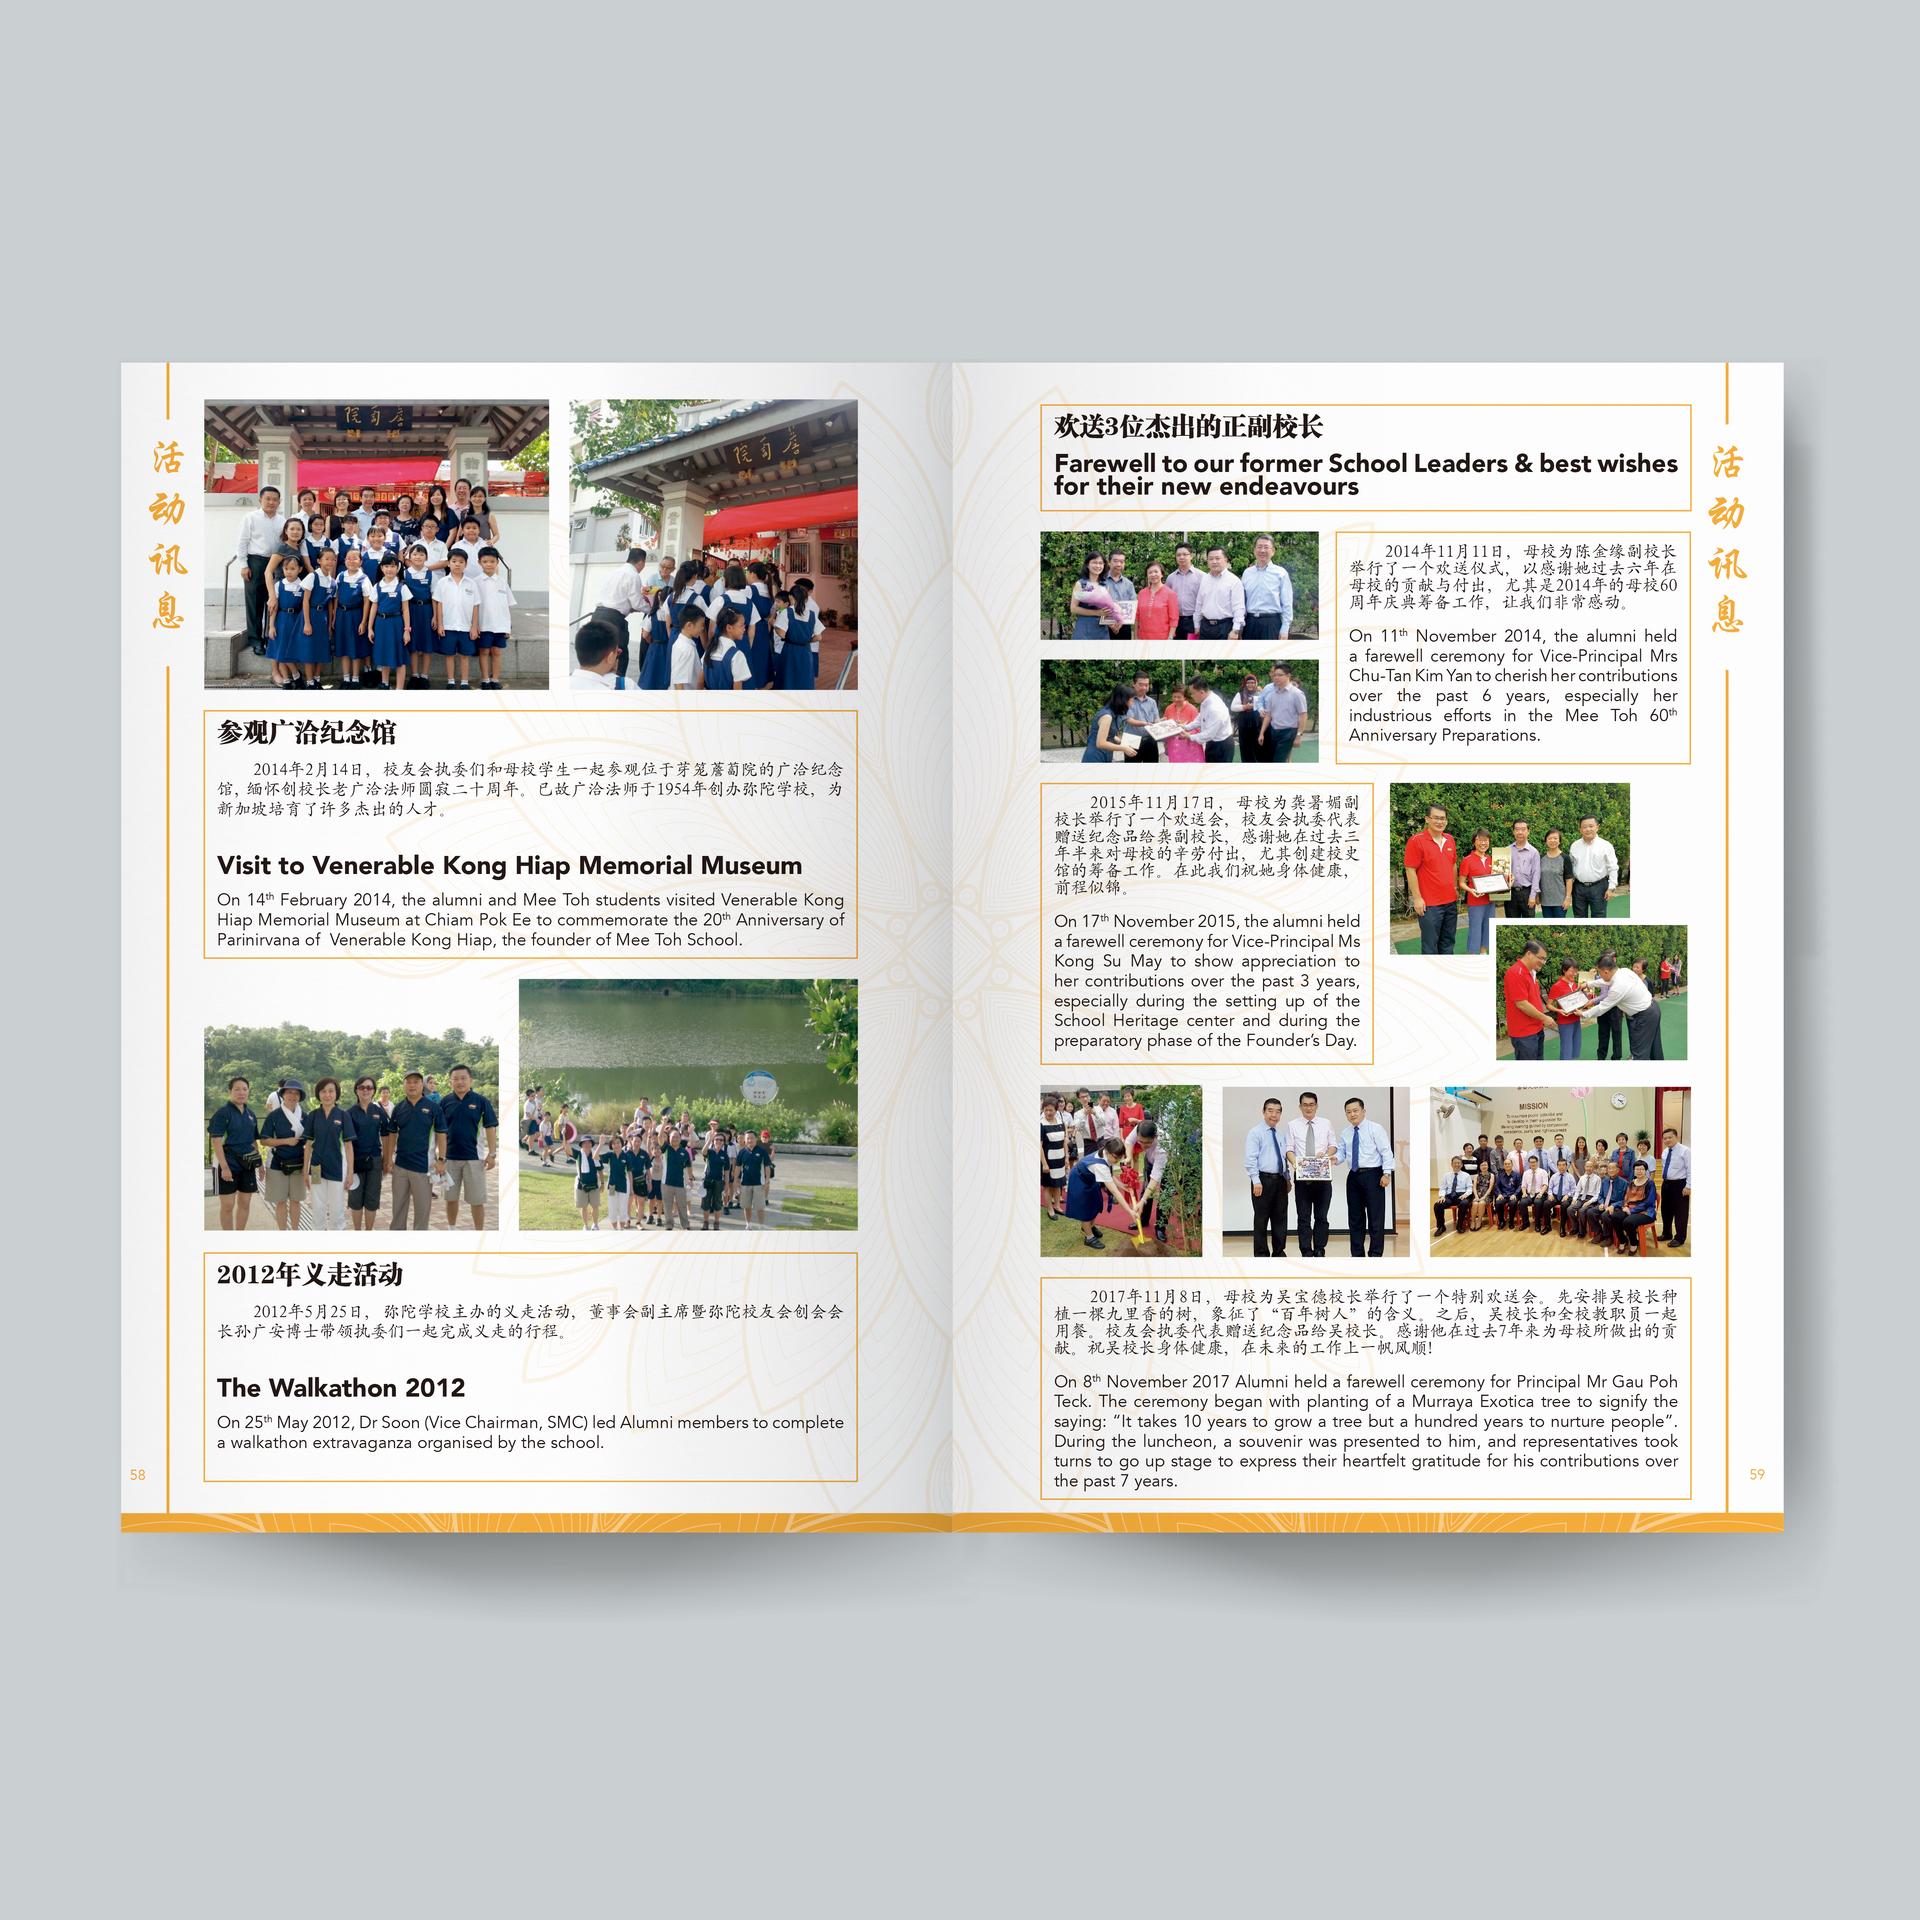 Mee-Toh-School-Alumni-Association-20th-A